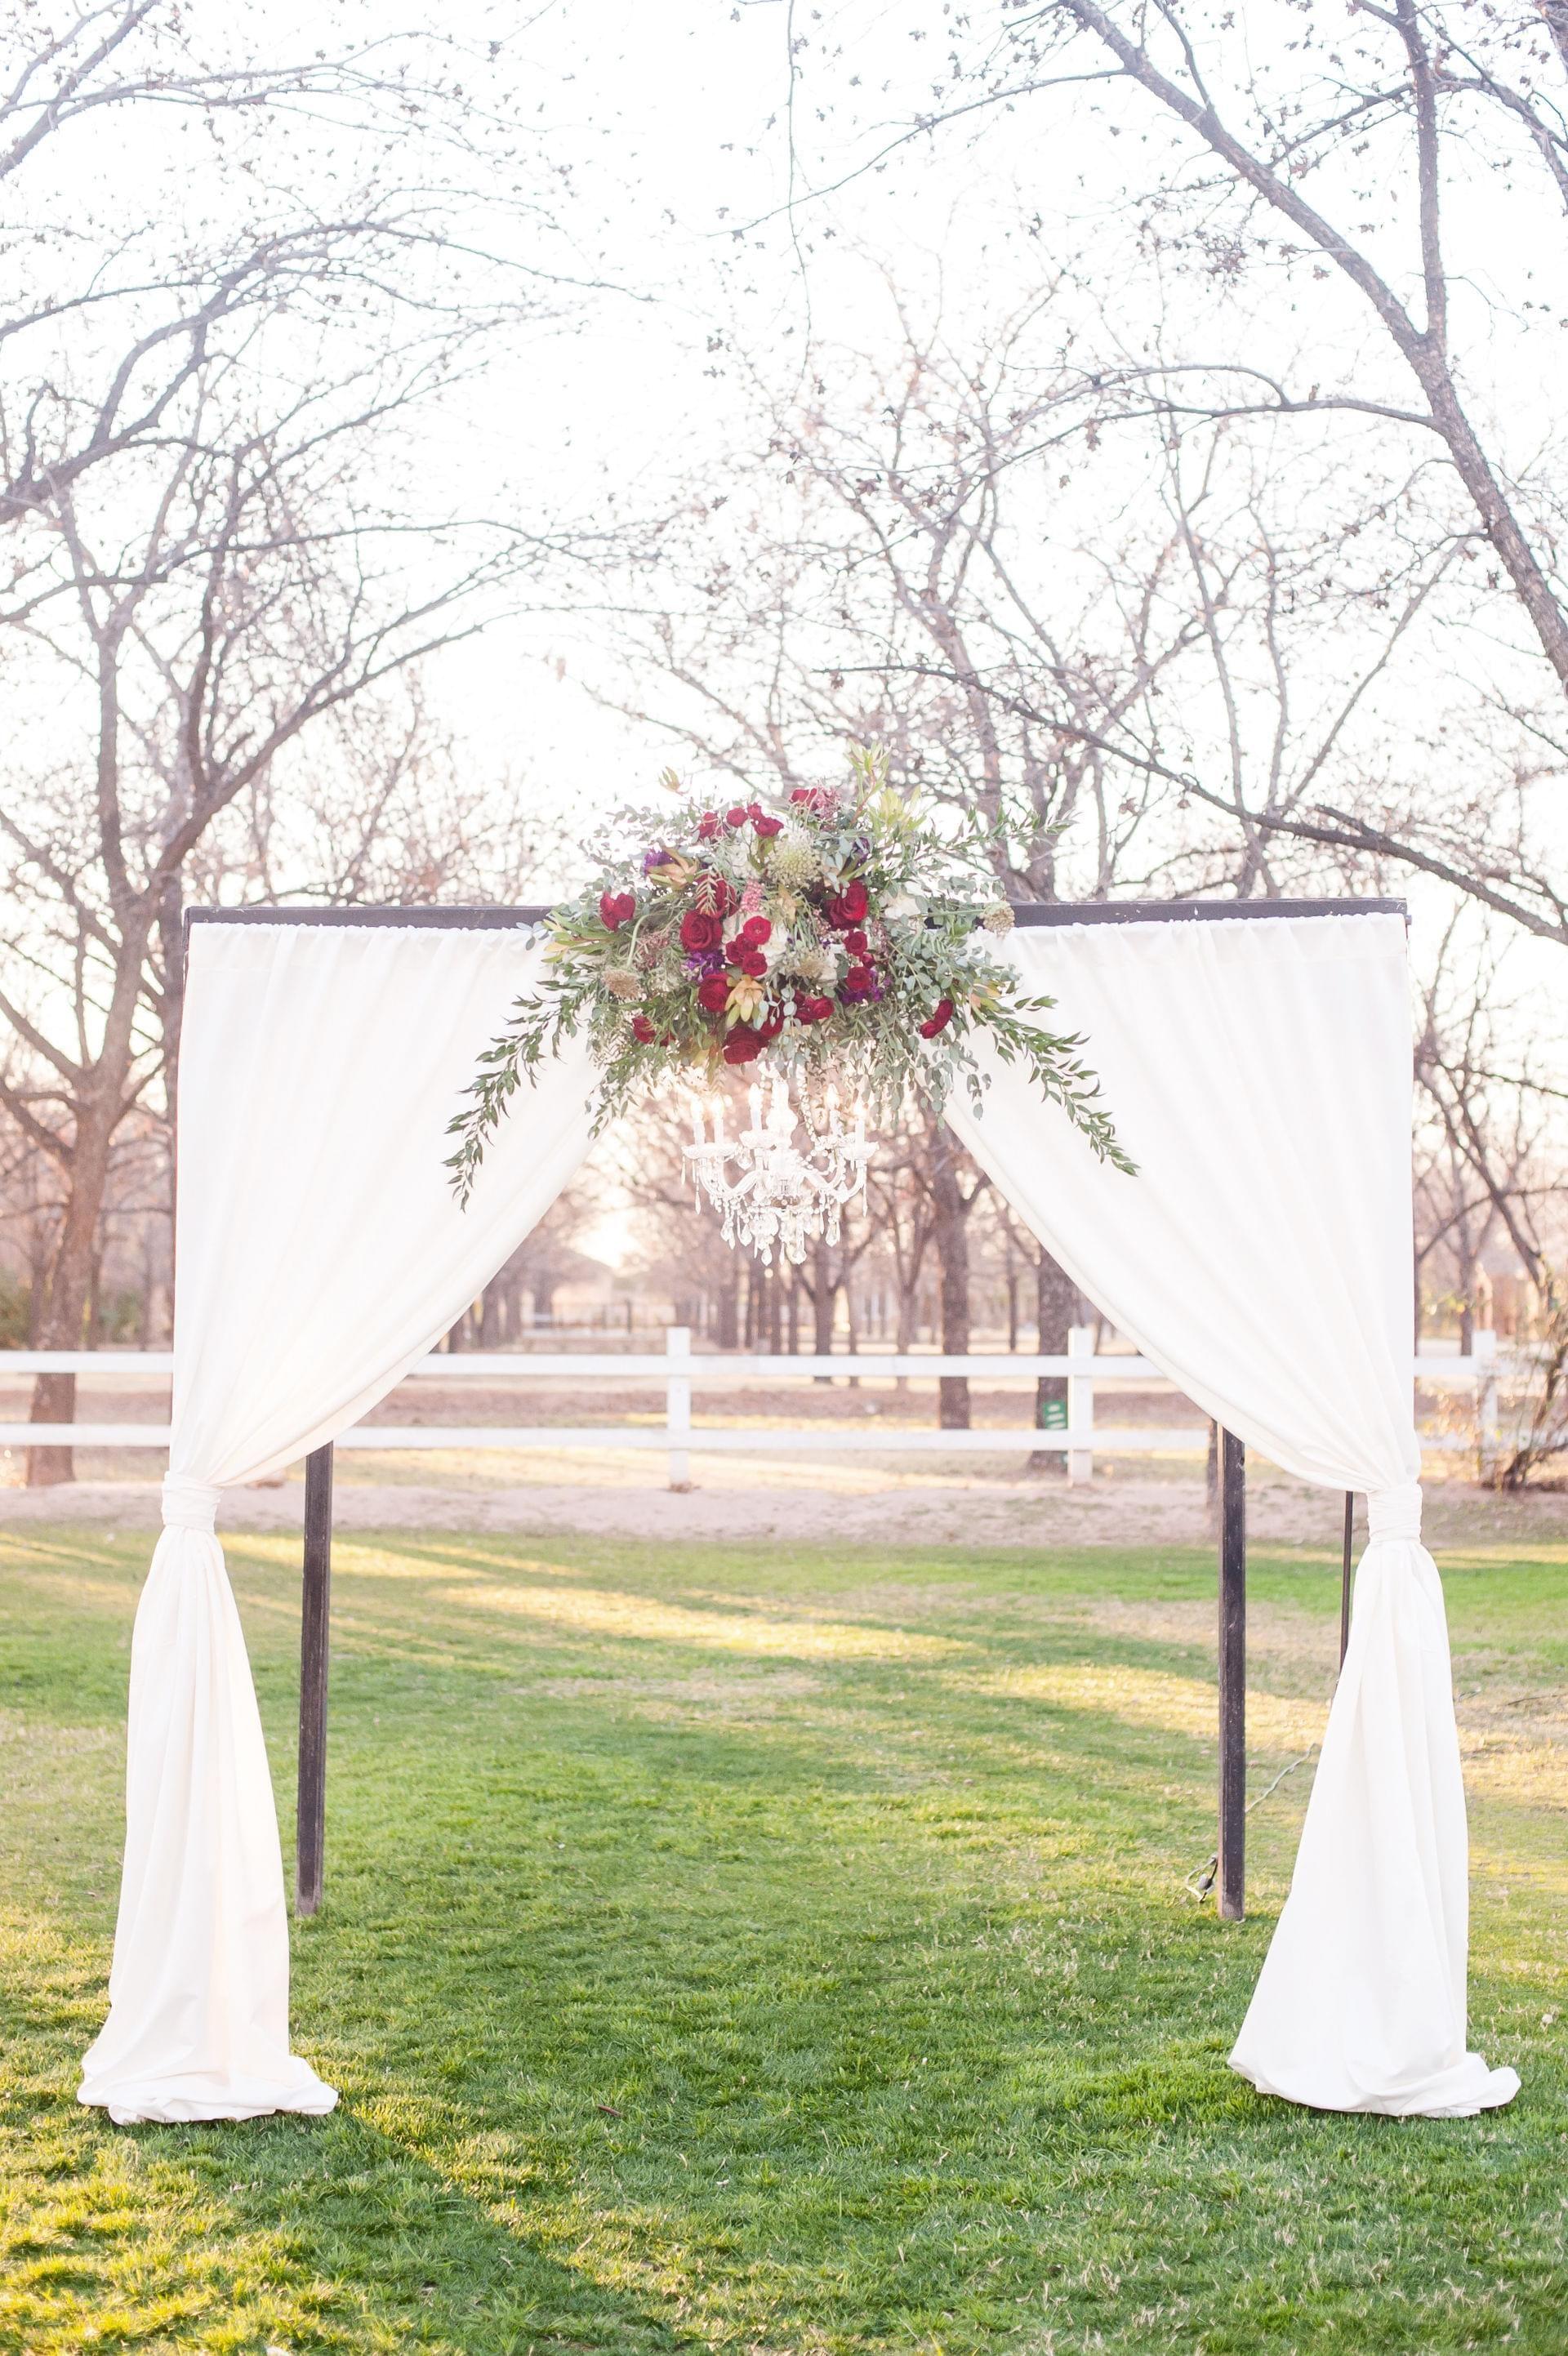 Romantic Outdoor Wedding Ceremony Arbor Ruby Red Flowers Draped